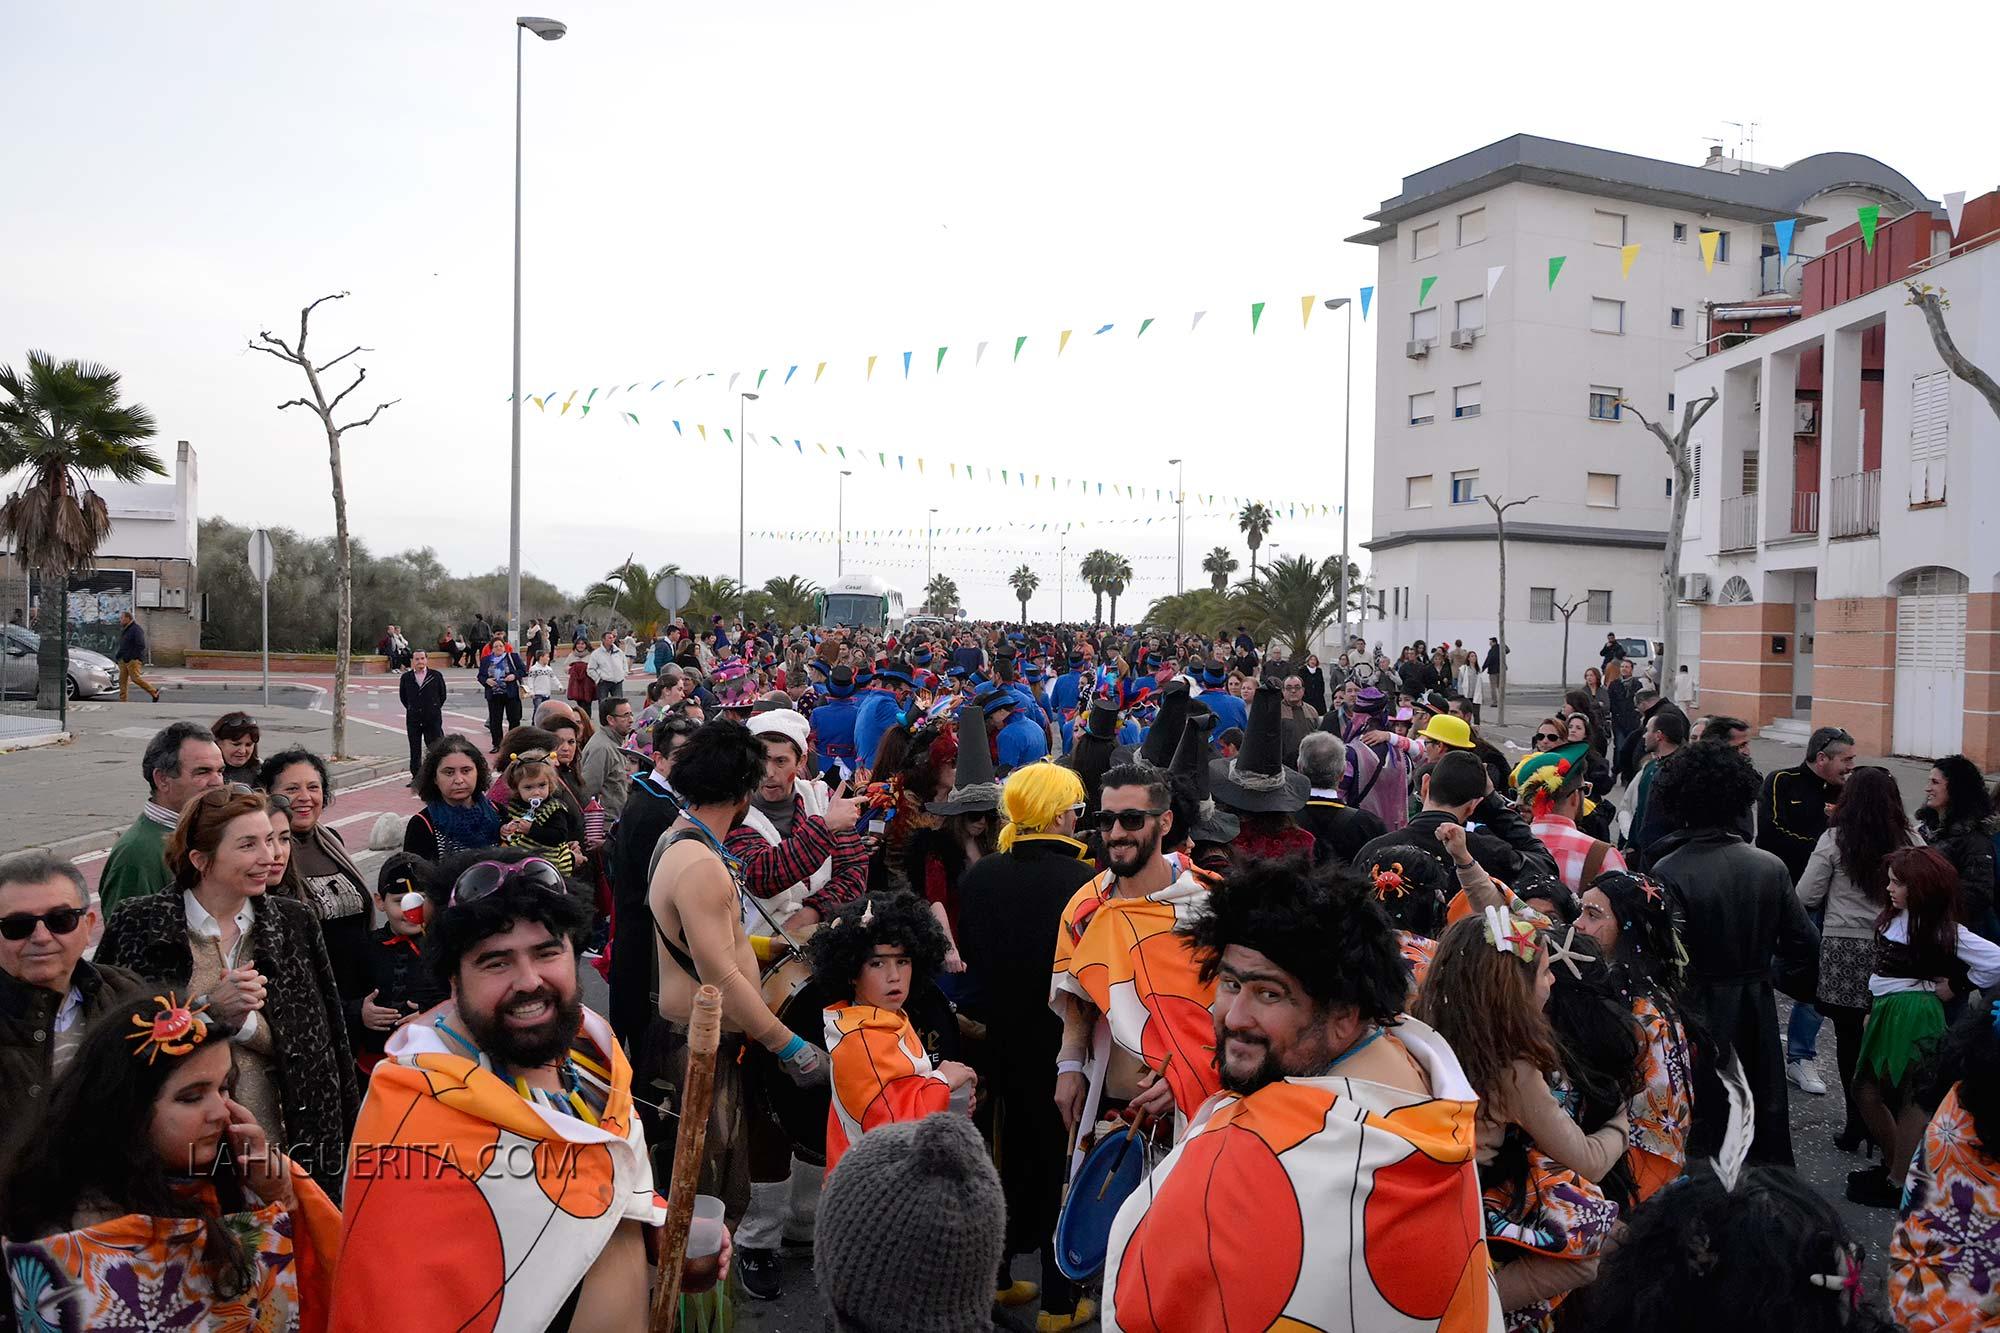 cabalgata carnaval isla cristina _DSC1042